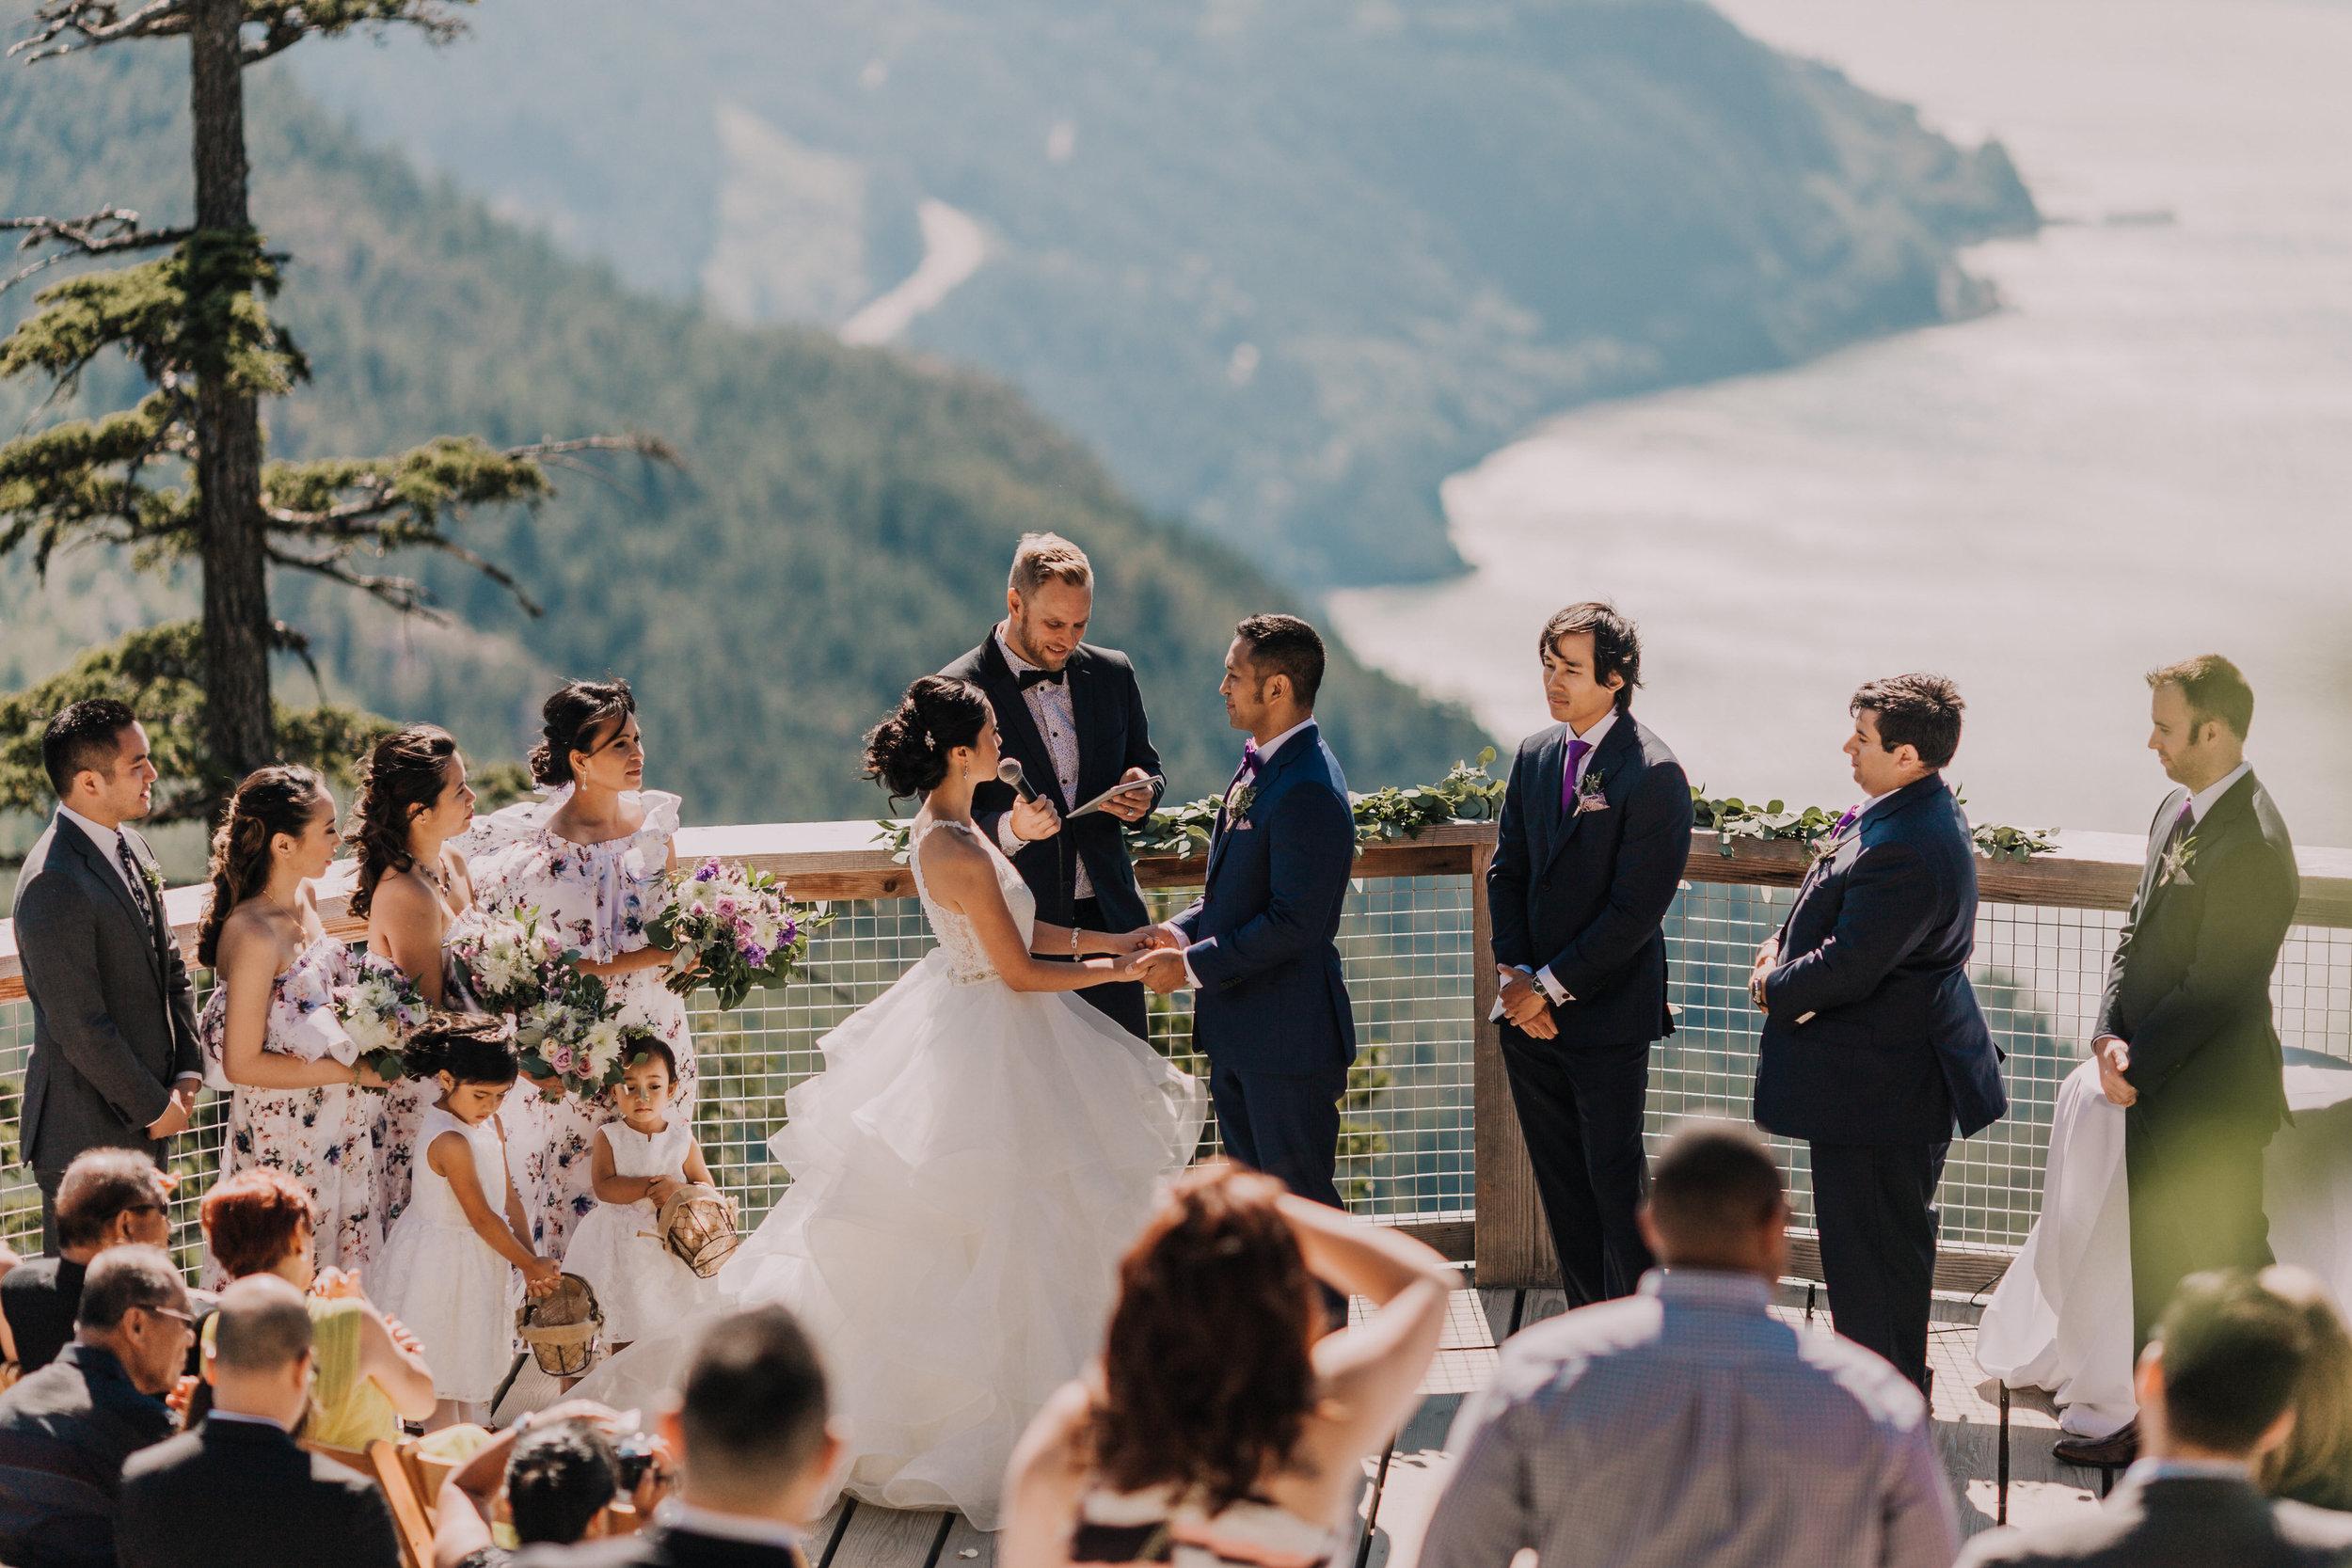 Squamish Wedding Photographer - Sea to Sky Gondola Wedding Photos -  Vancouver Wedding Photographer & Videographer - Sunshine Coast Wedding Photos - Sunshine Coast Wedding Photographer - Jennifer Picard Photography - IMG_0350.jpg